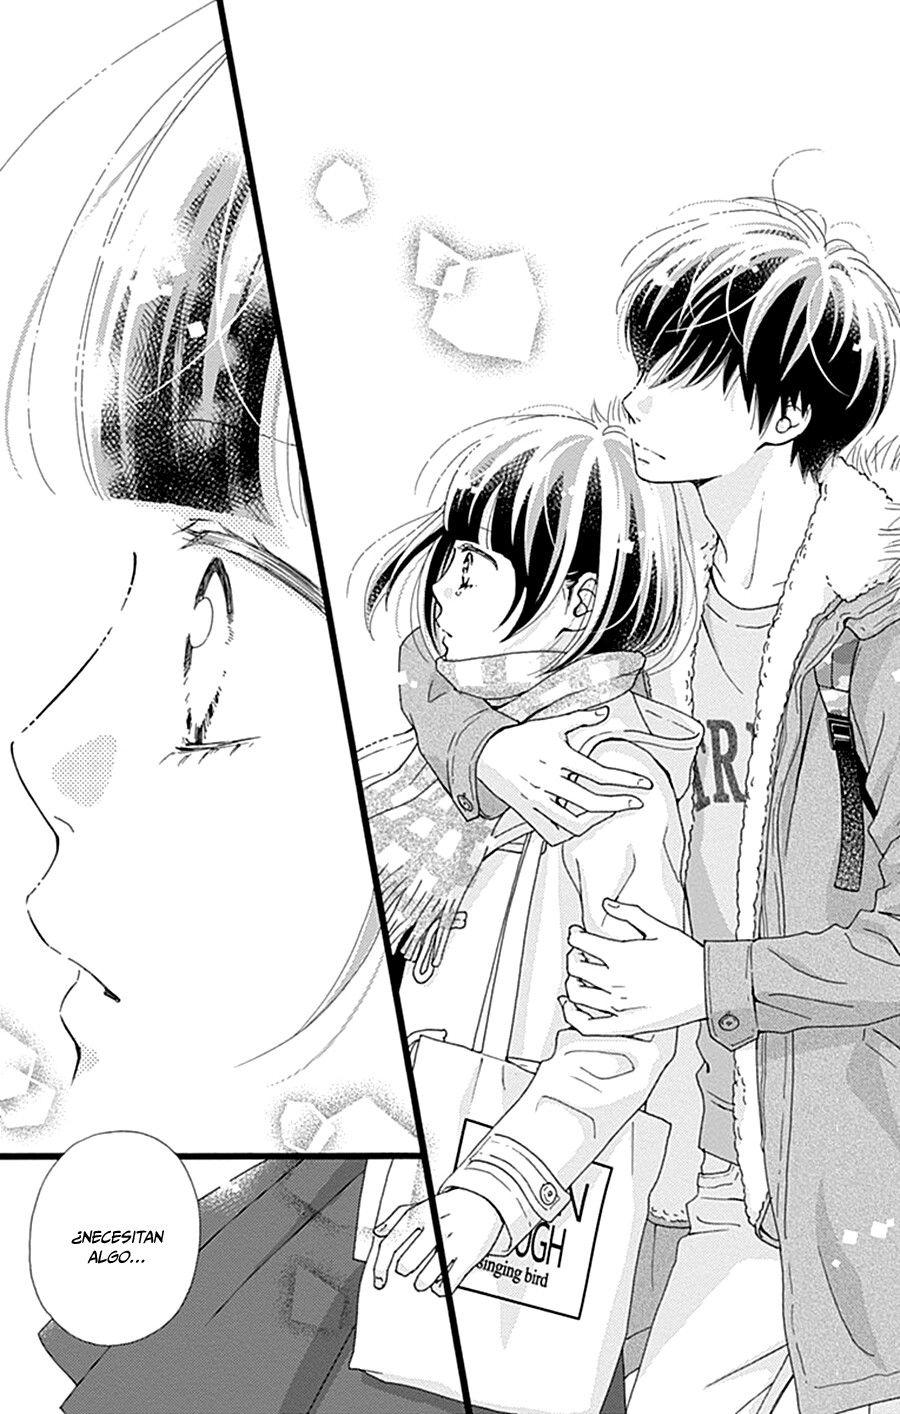 Futsuu No Koiko Chan Manga Amor Manga Romance Manga Shoujo